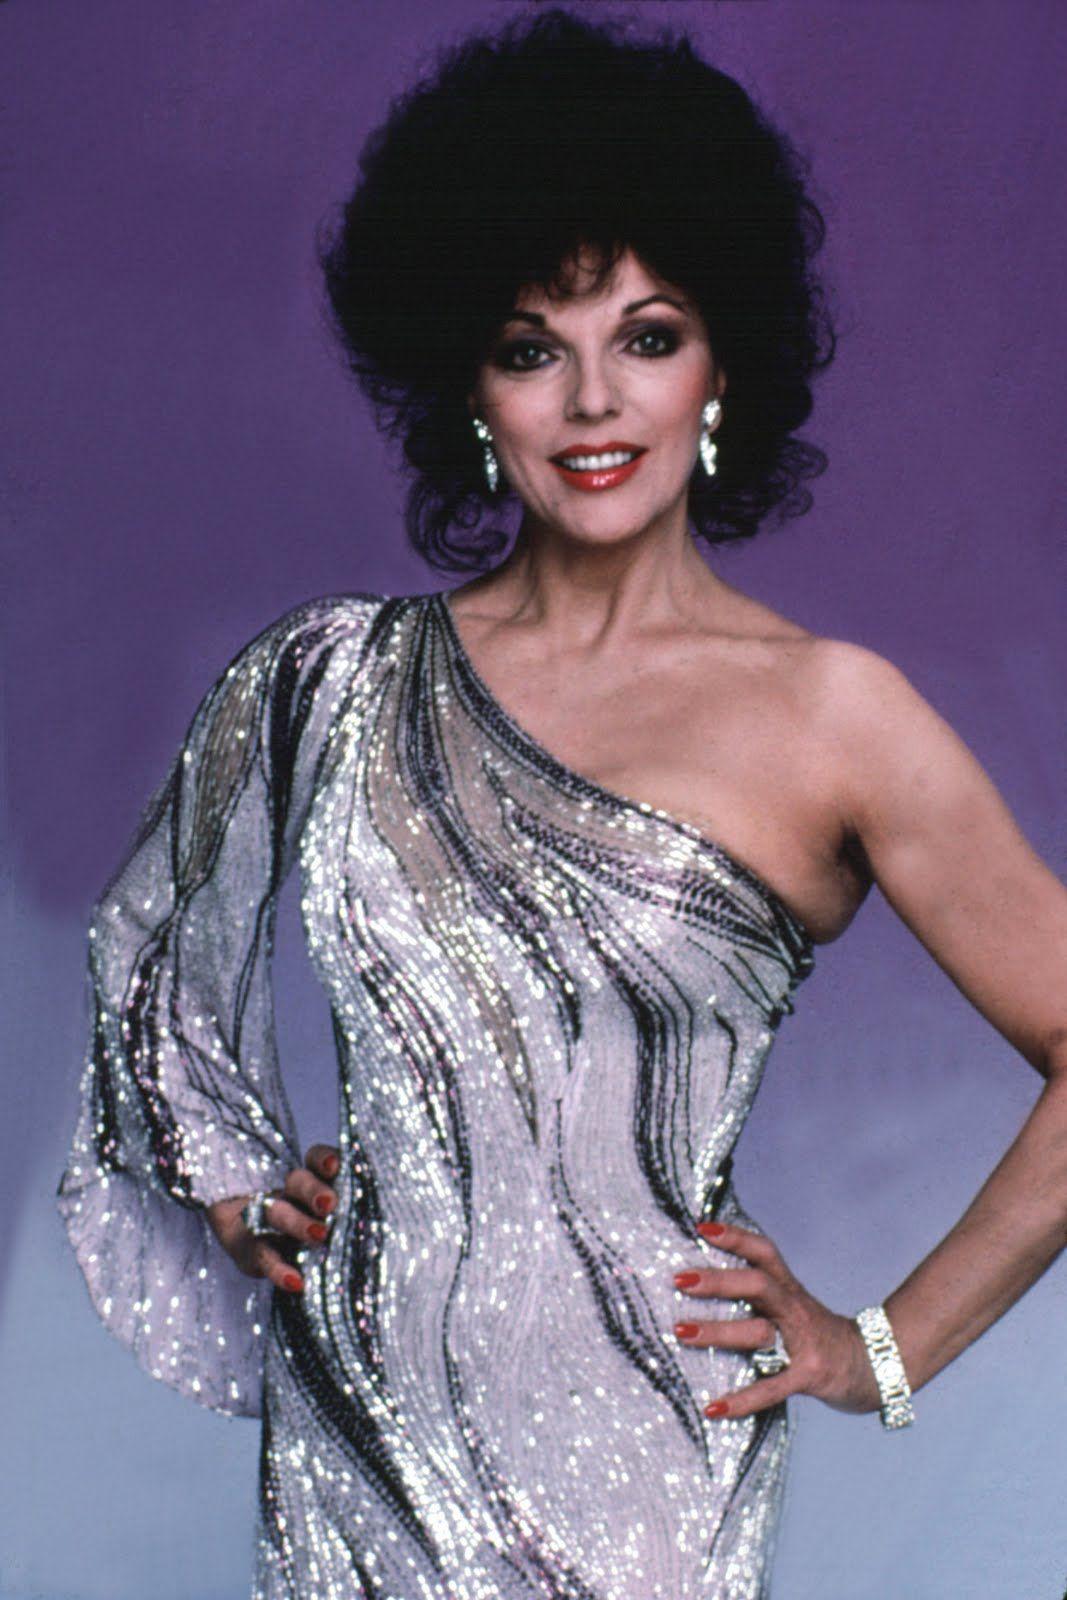 Thời trang Joan Collins in Dynasty